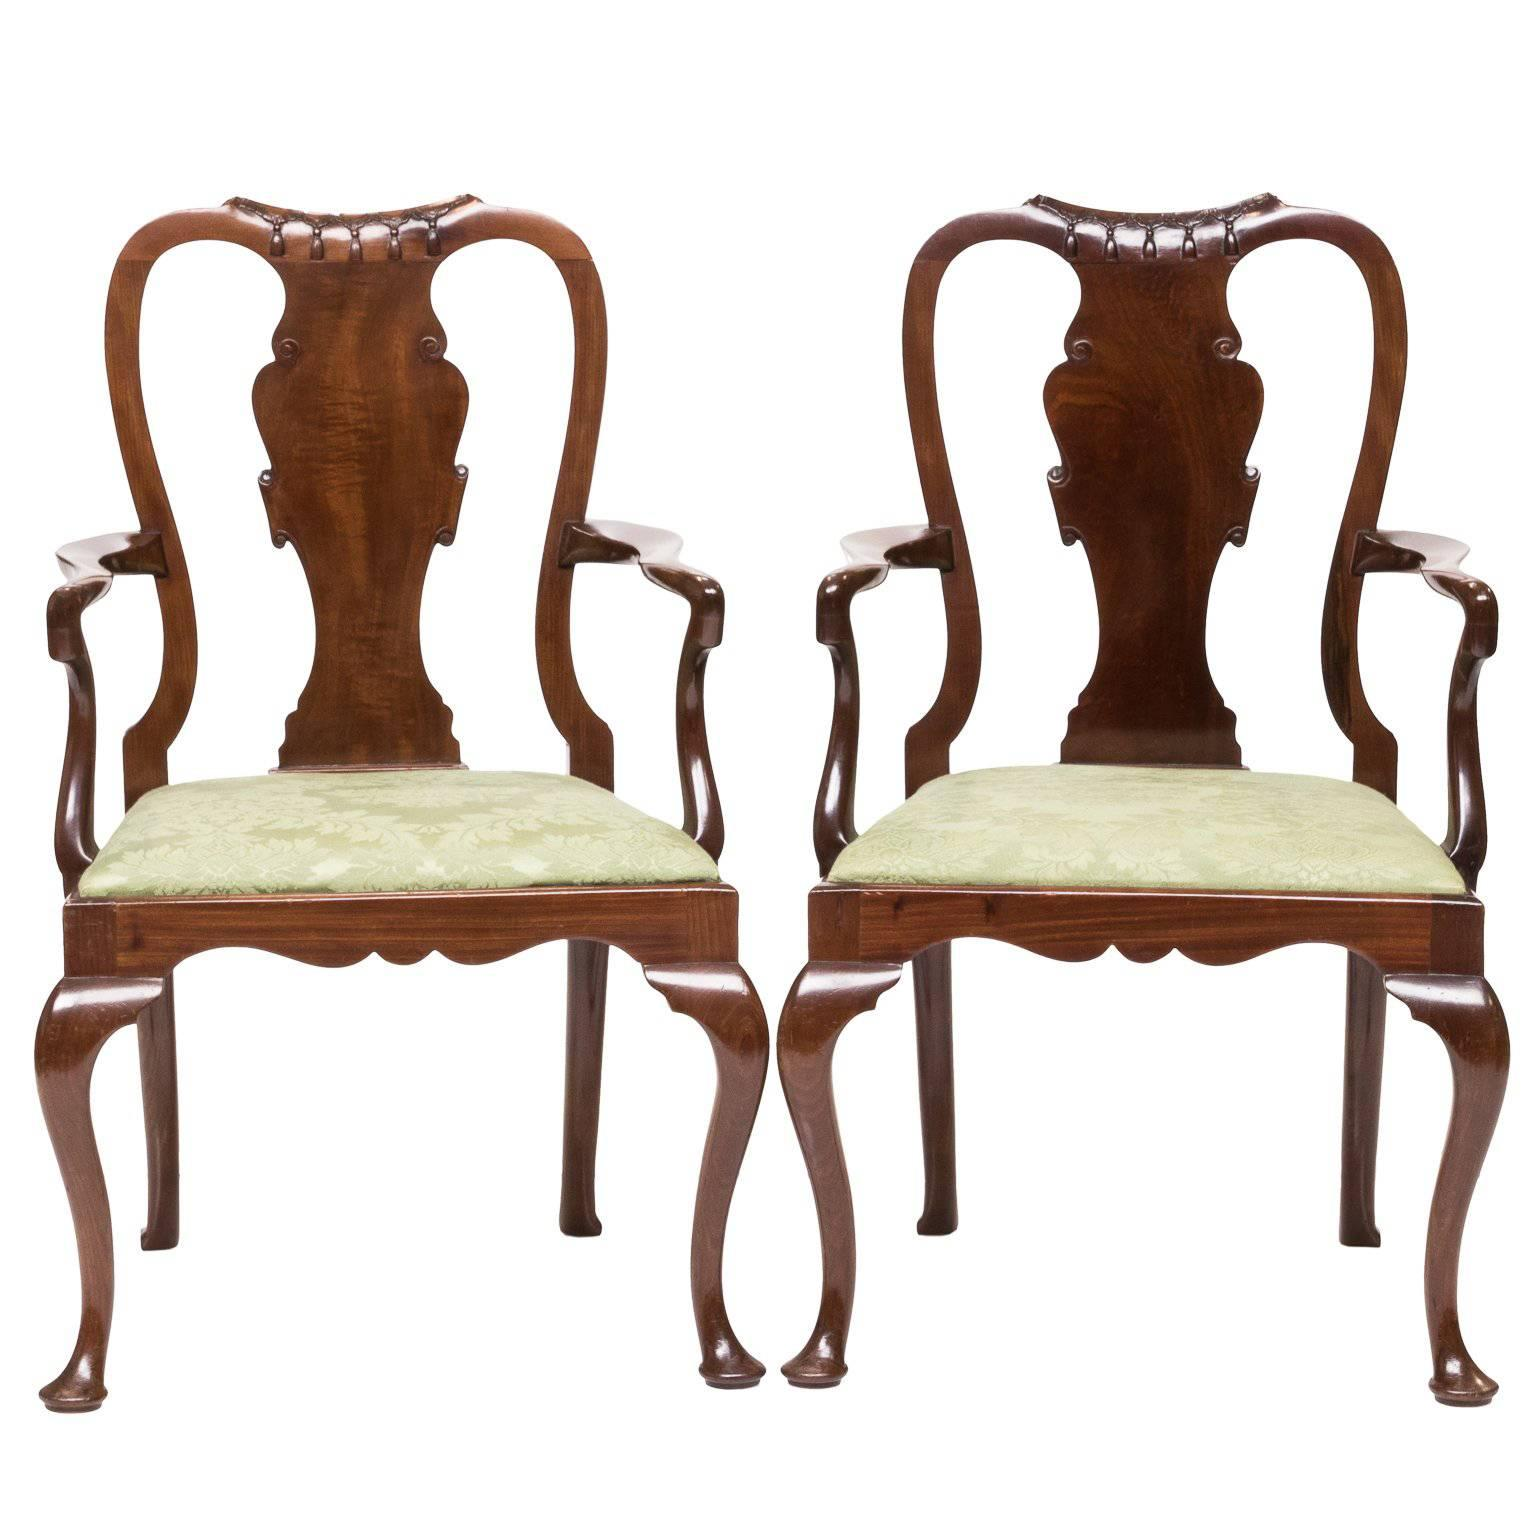 Attirant Pair Of 19th Century Queen Anne Childs Chairs